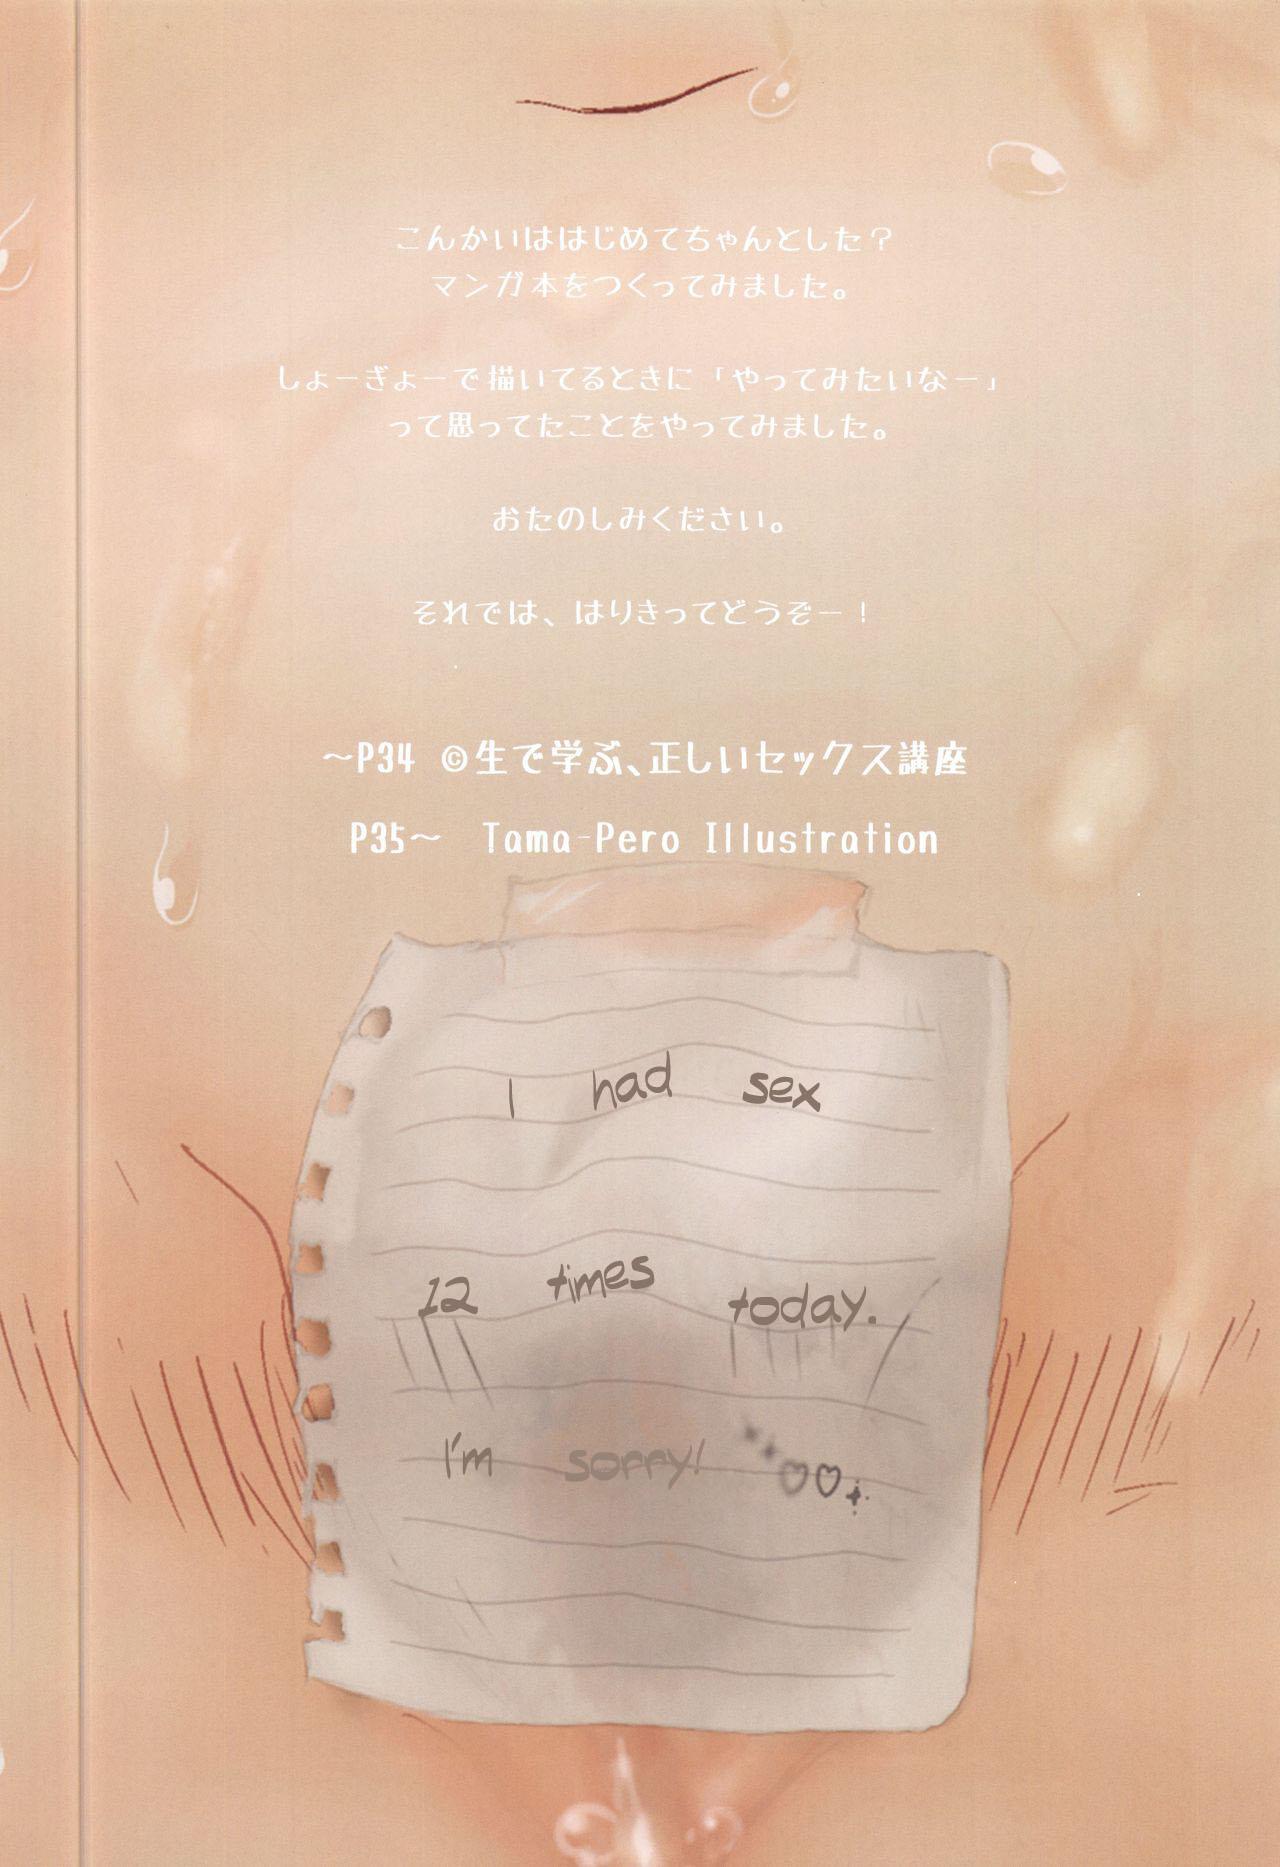 [Peromex (Tamanoi Peromekuri)] ©-sei de Manabu, Tadashii Sex Kouza   JC Hands-On Proper Sex Lecture [English] [bientaimon] [2019-11-09] 2